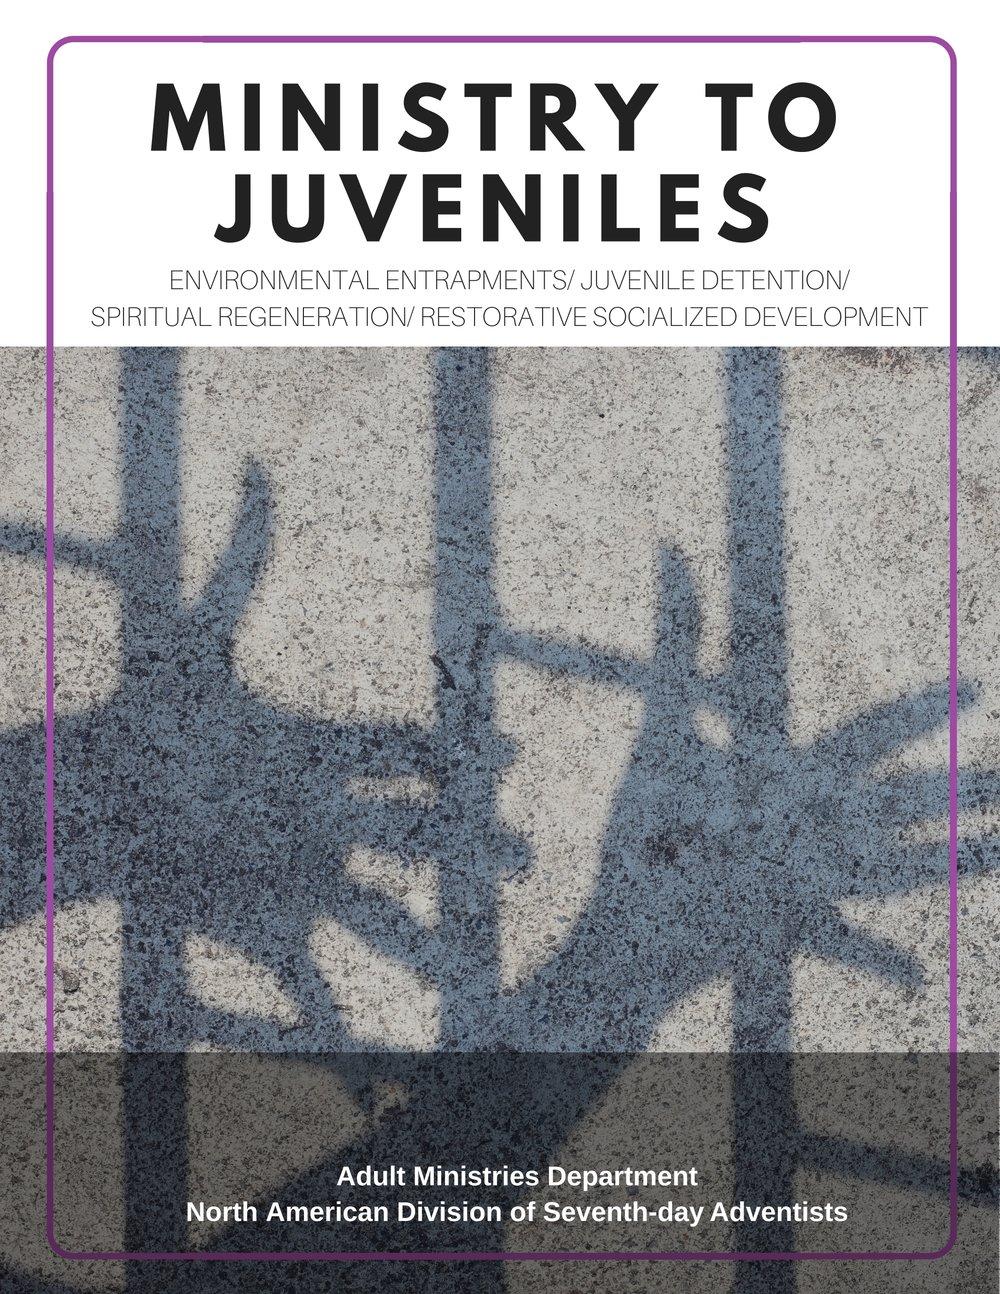 Ministry to Juveniles Handbook cover.jpg